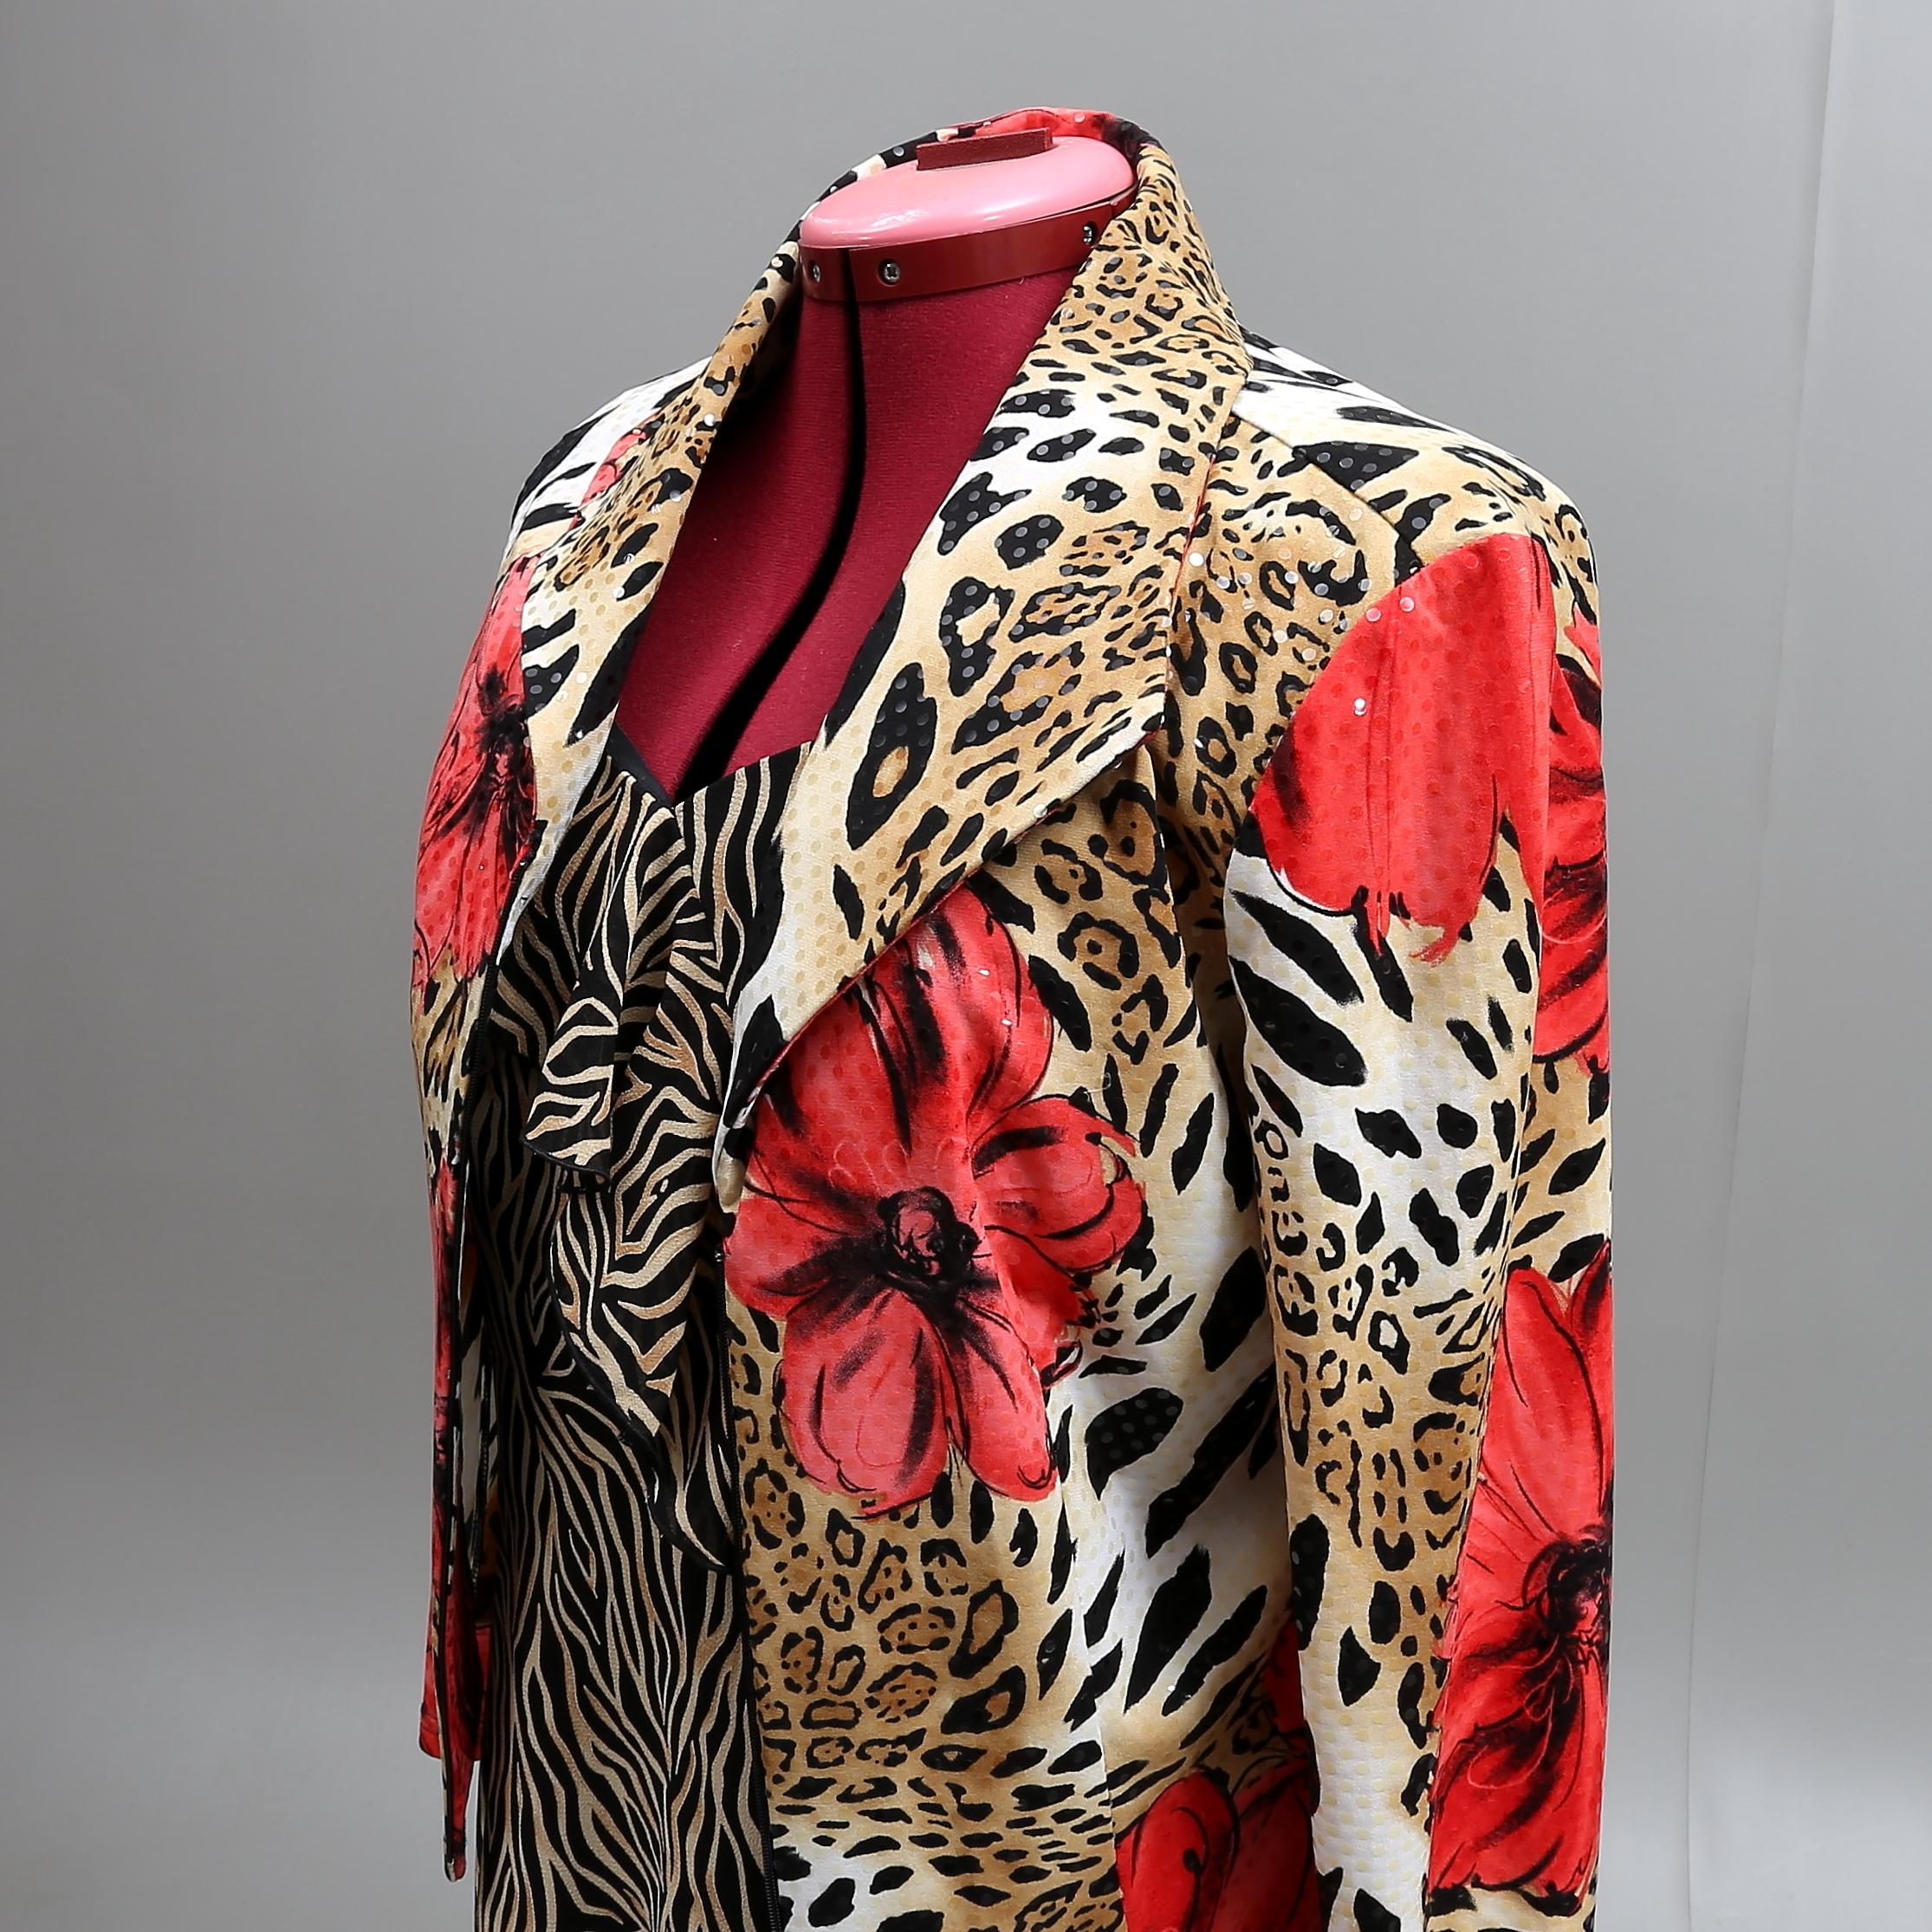 fb4e31b7337f KLÄNNING samt JACKA, Joseph Ribkoff. Vintage clothing & Accessories -  Auctionet